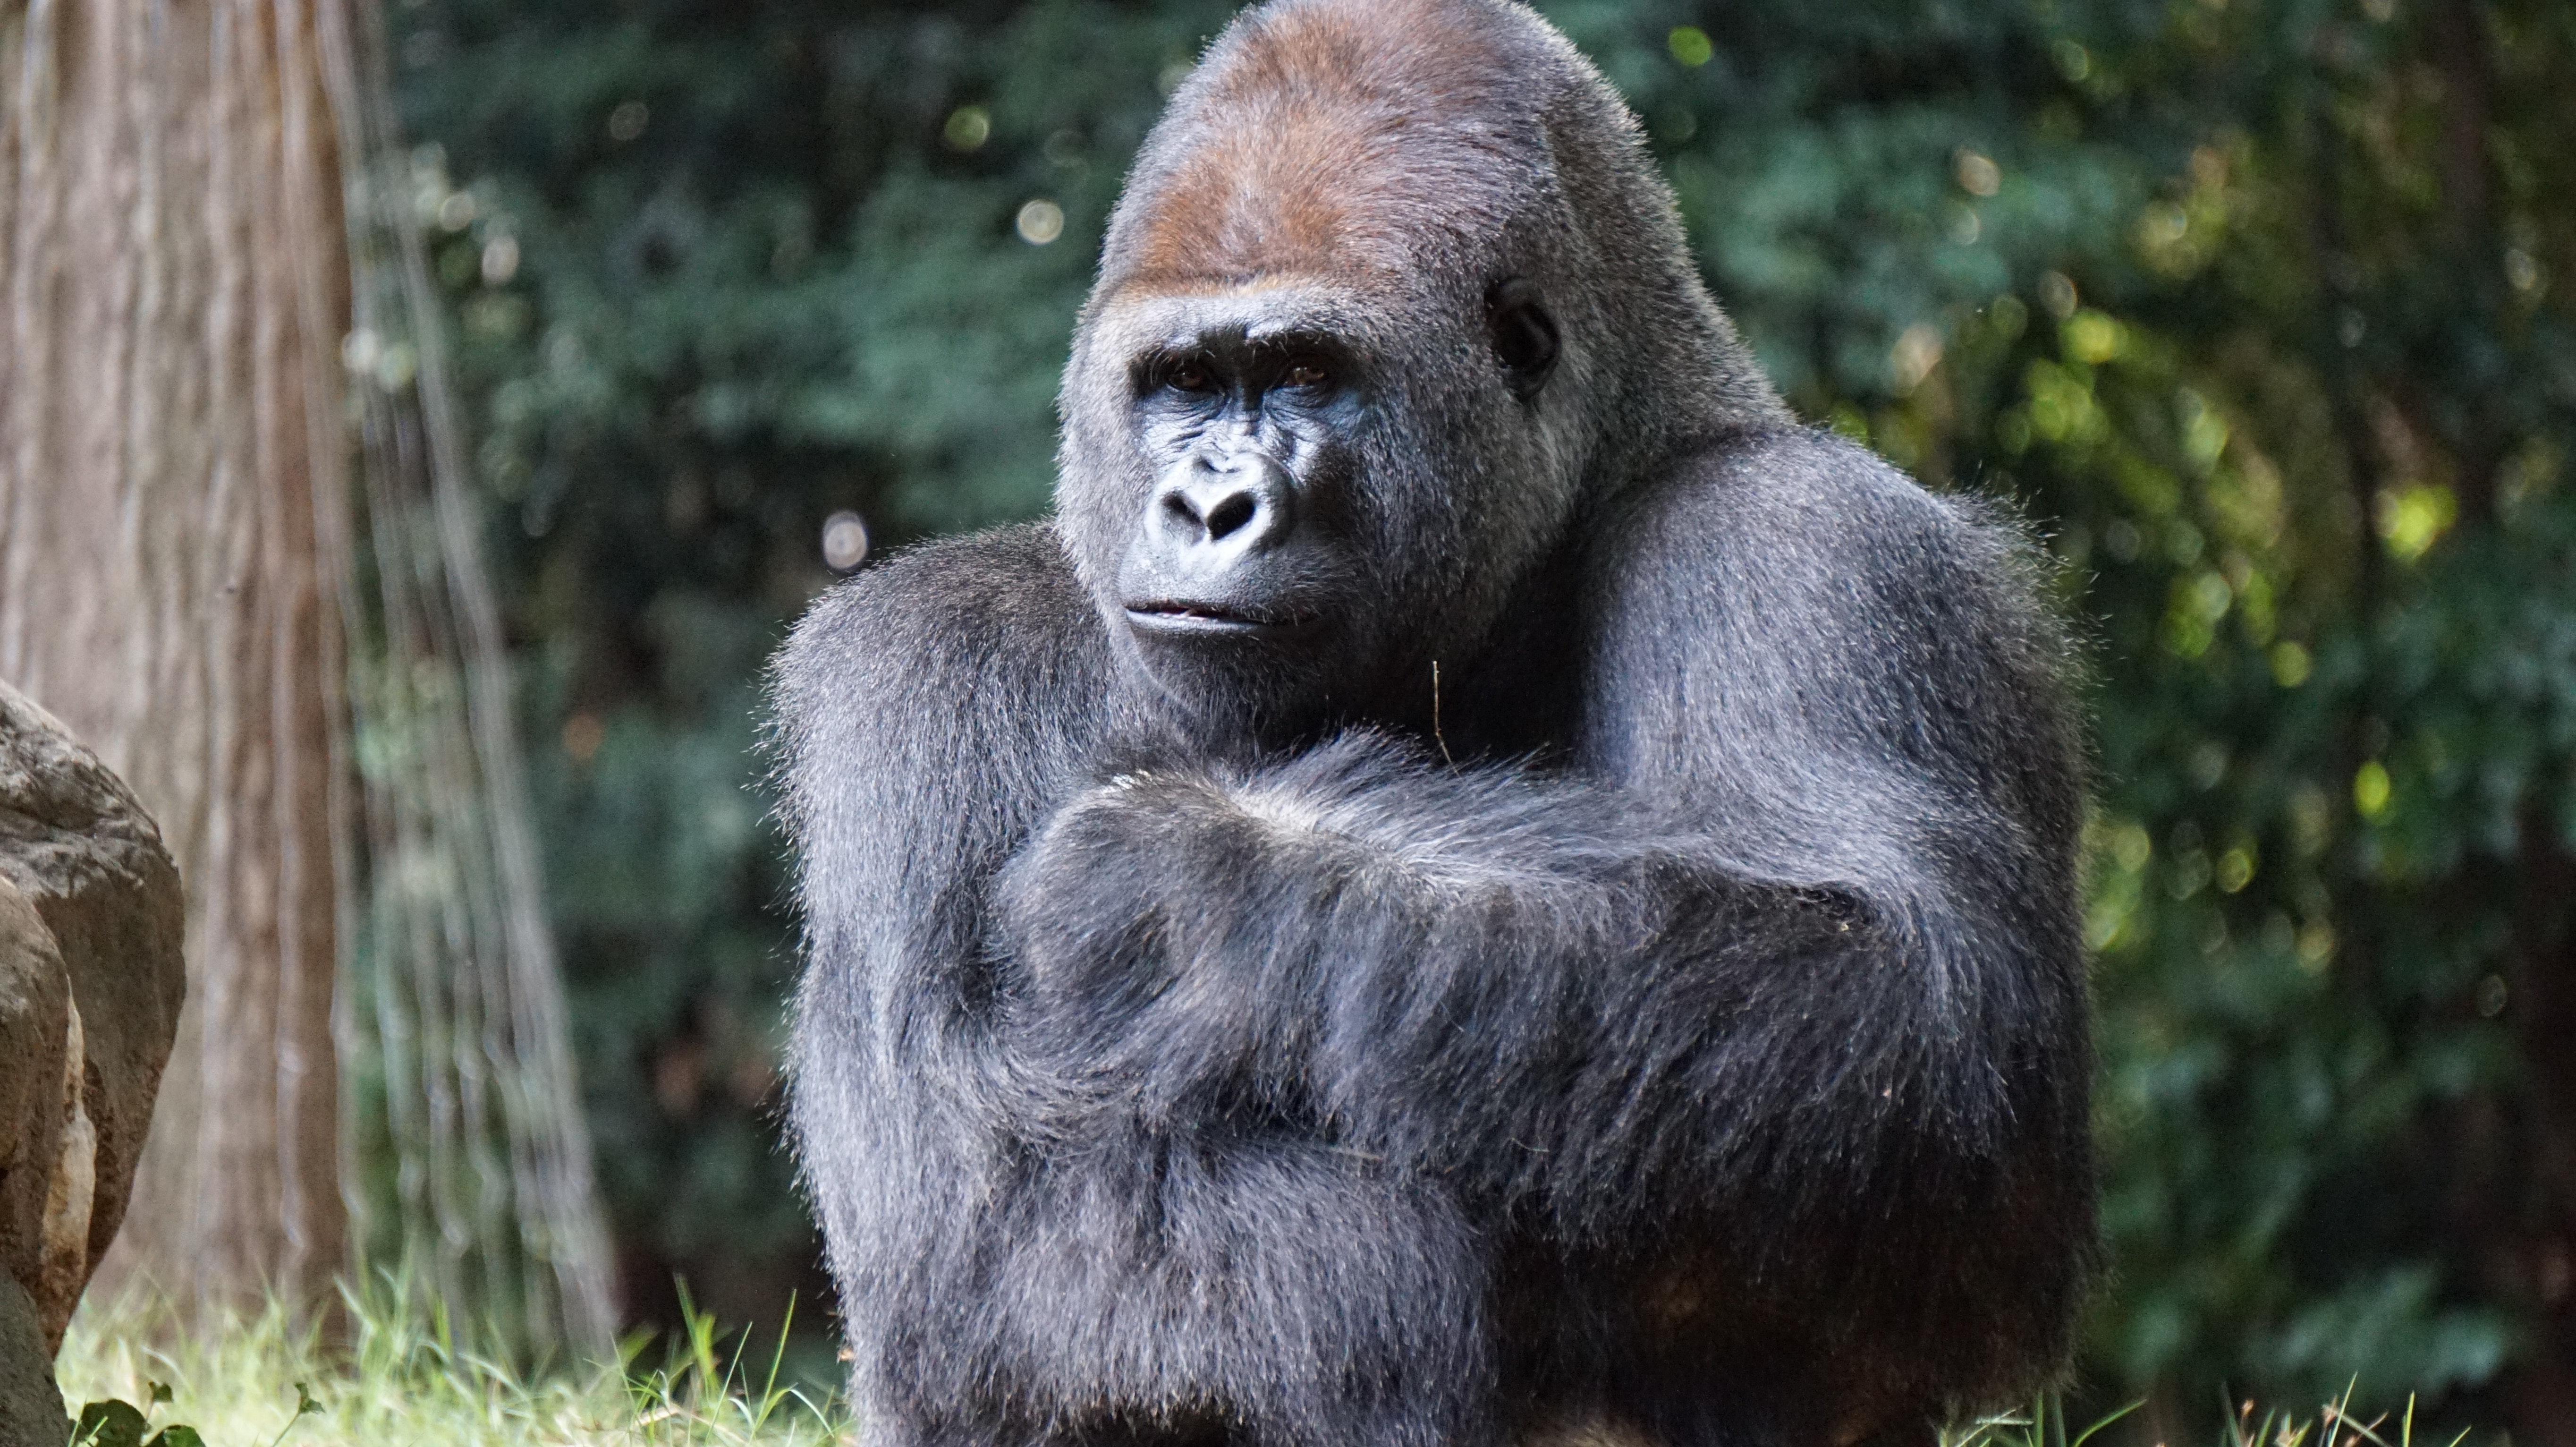 Gorilla Beside Brown Rock, Animal, Outdoors, Wildlife, Wild, HQ Photo